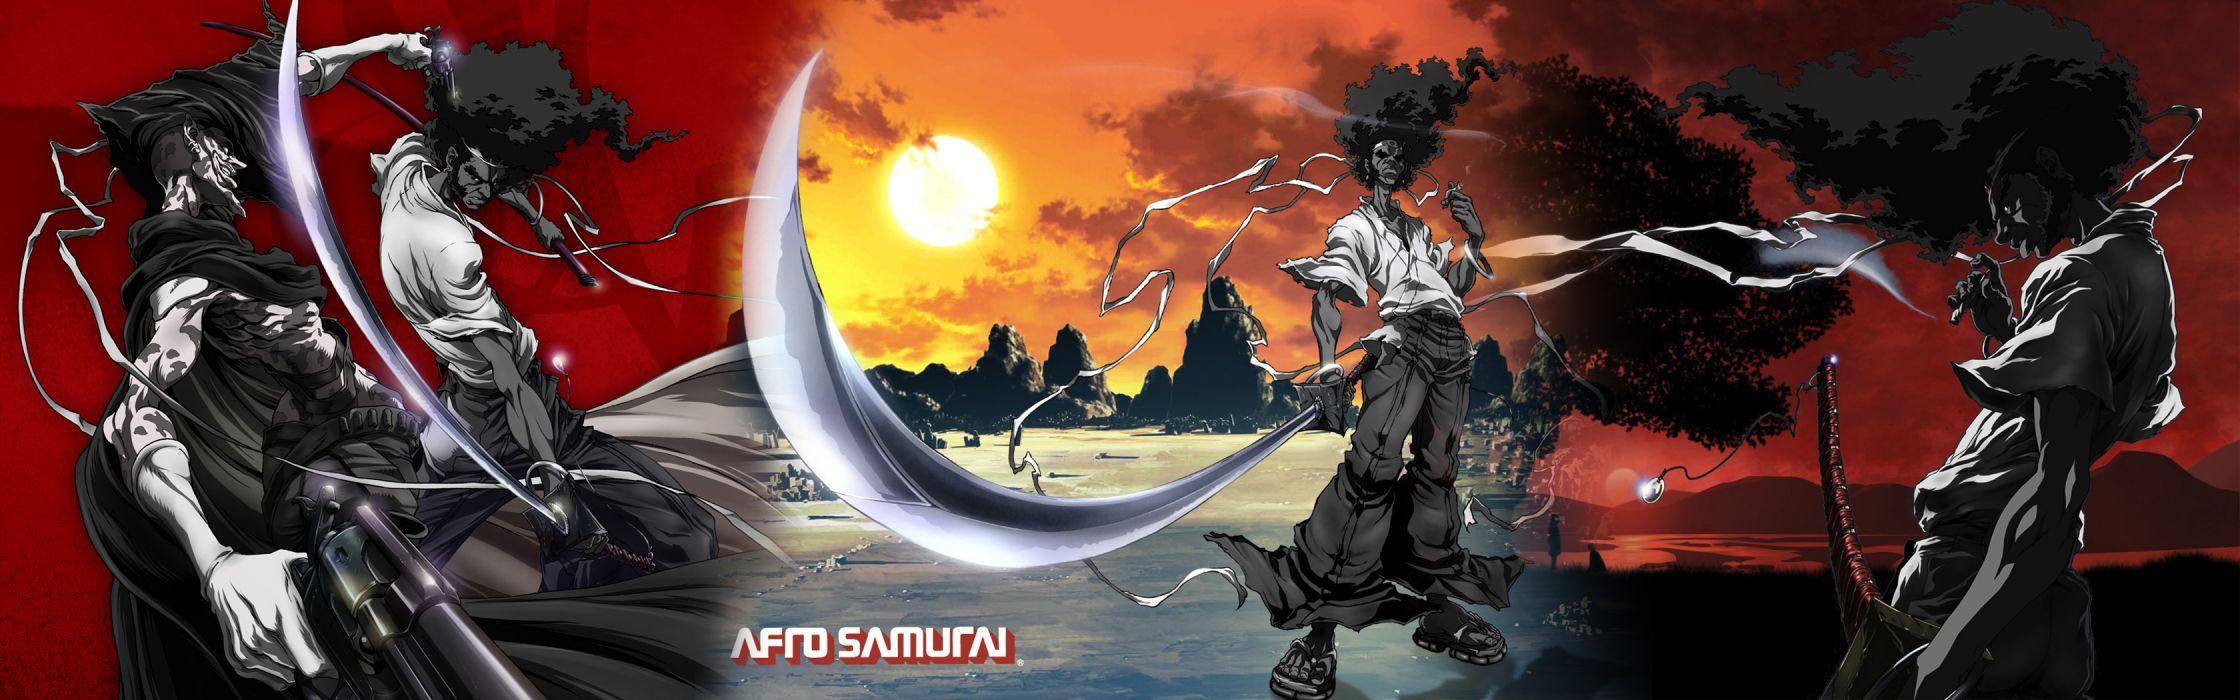 Afro Samurai dual multi anime game   b wallpaper